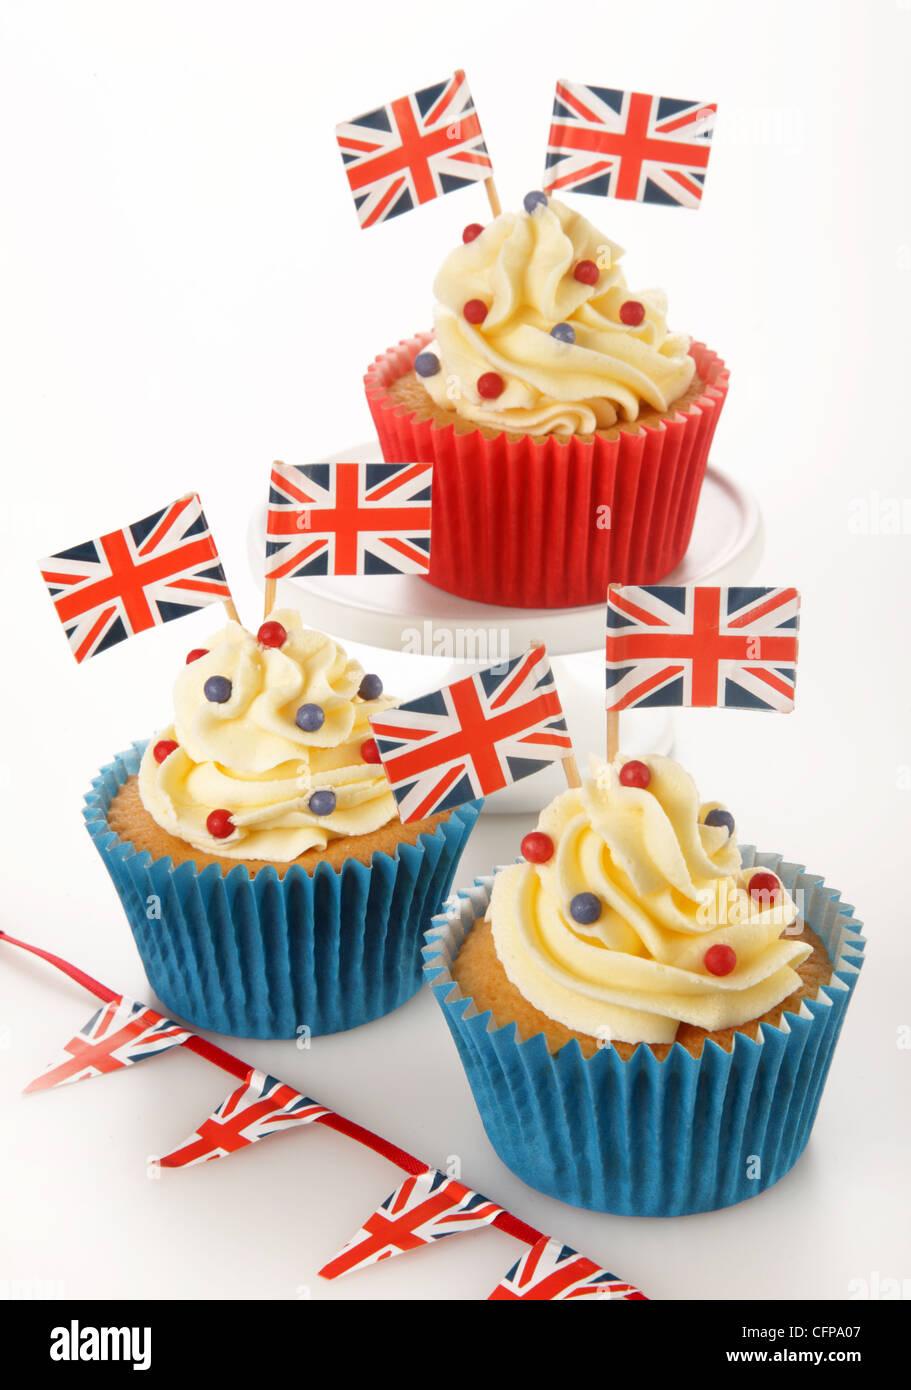 BRITISH CELEBRATION CUPCAKES - Stock Image